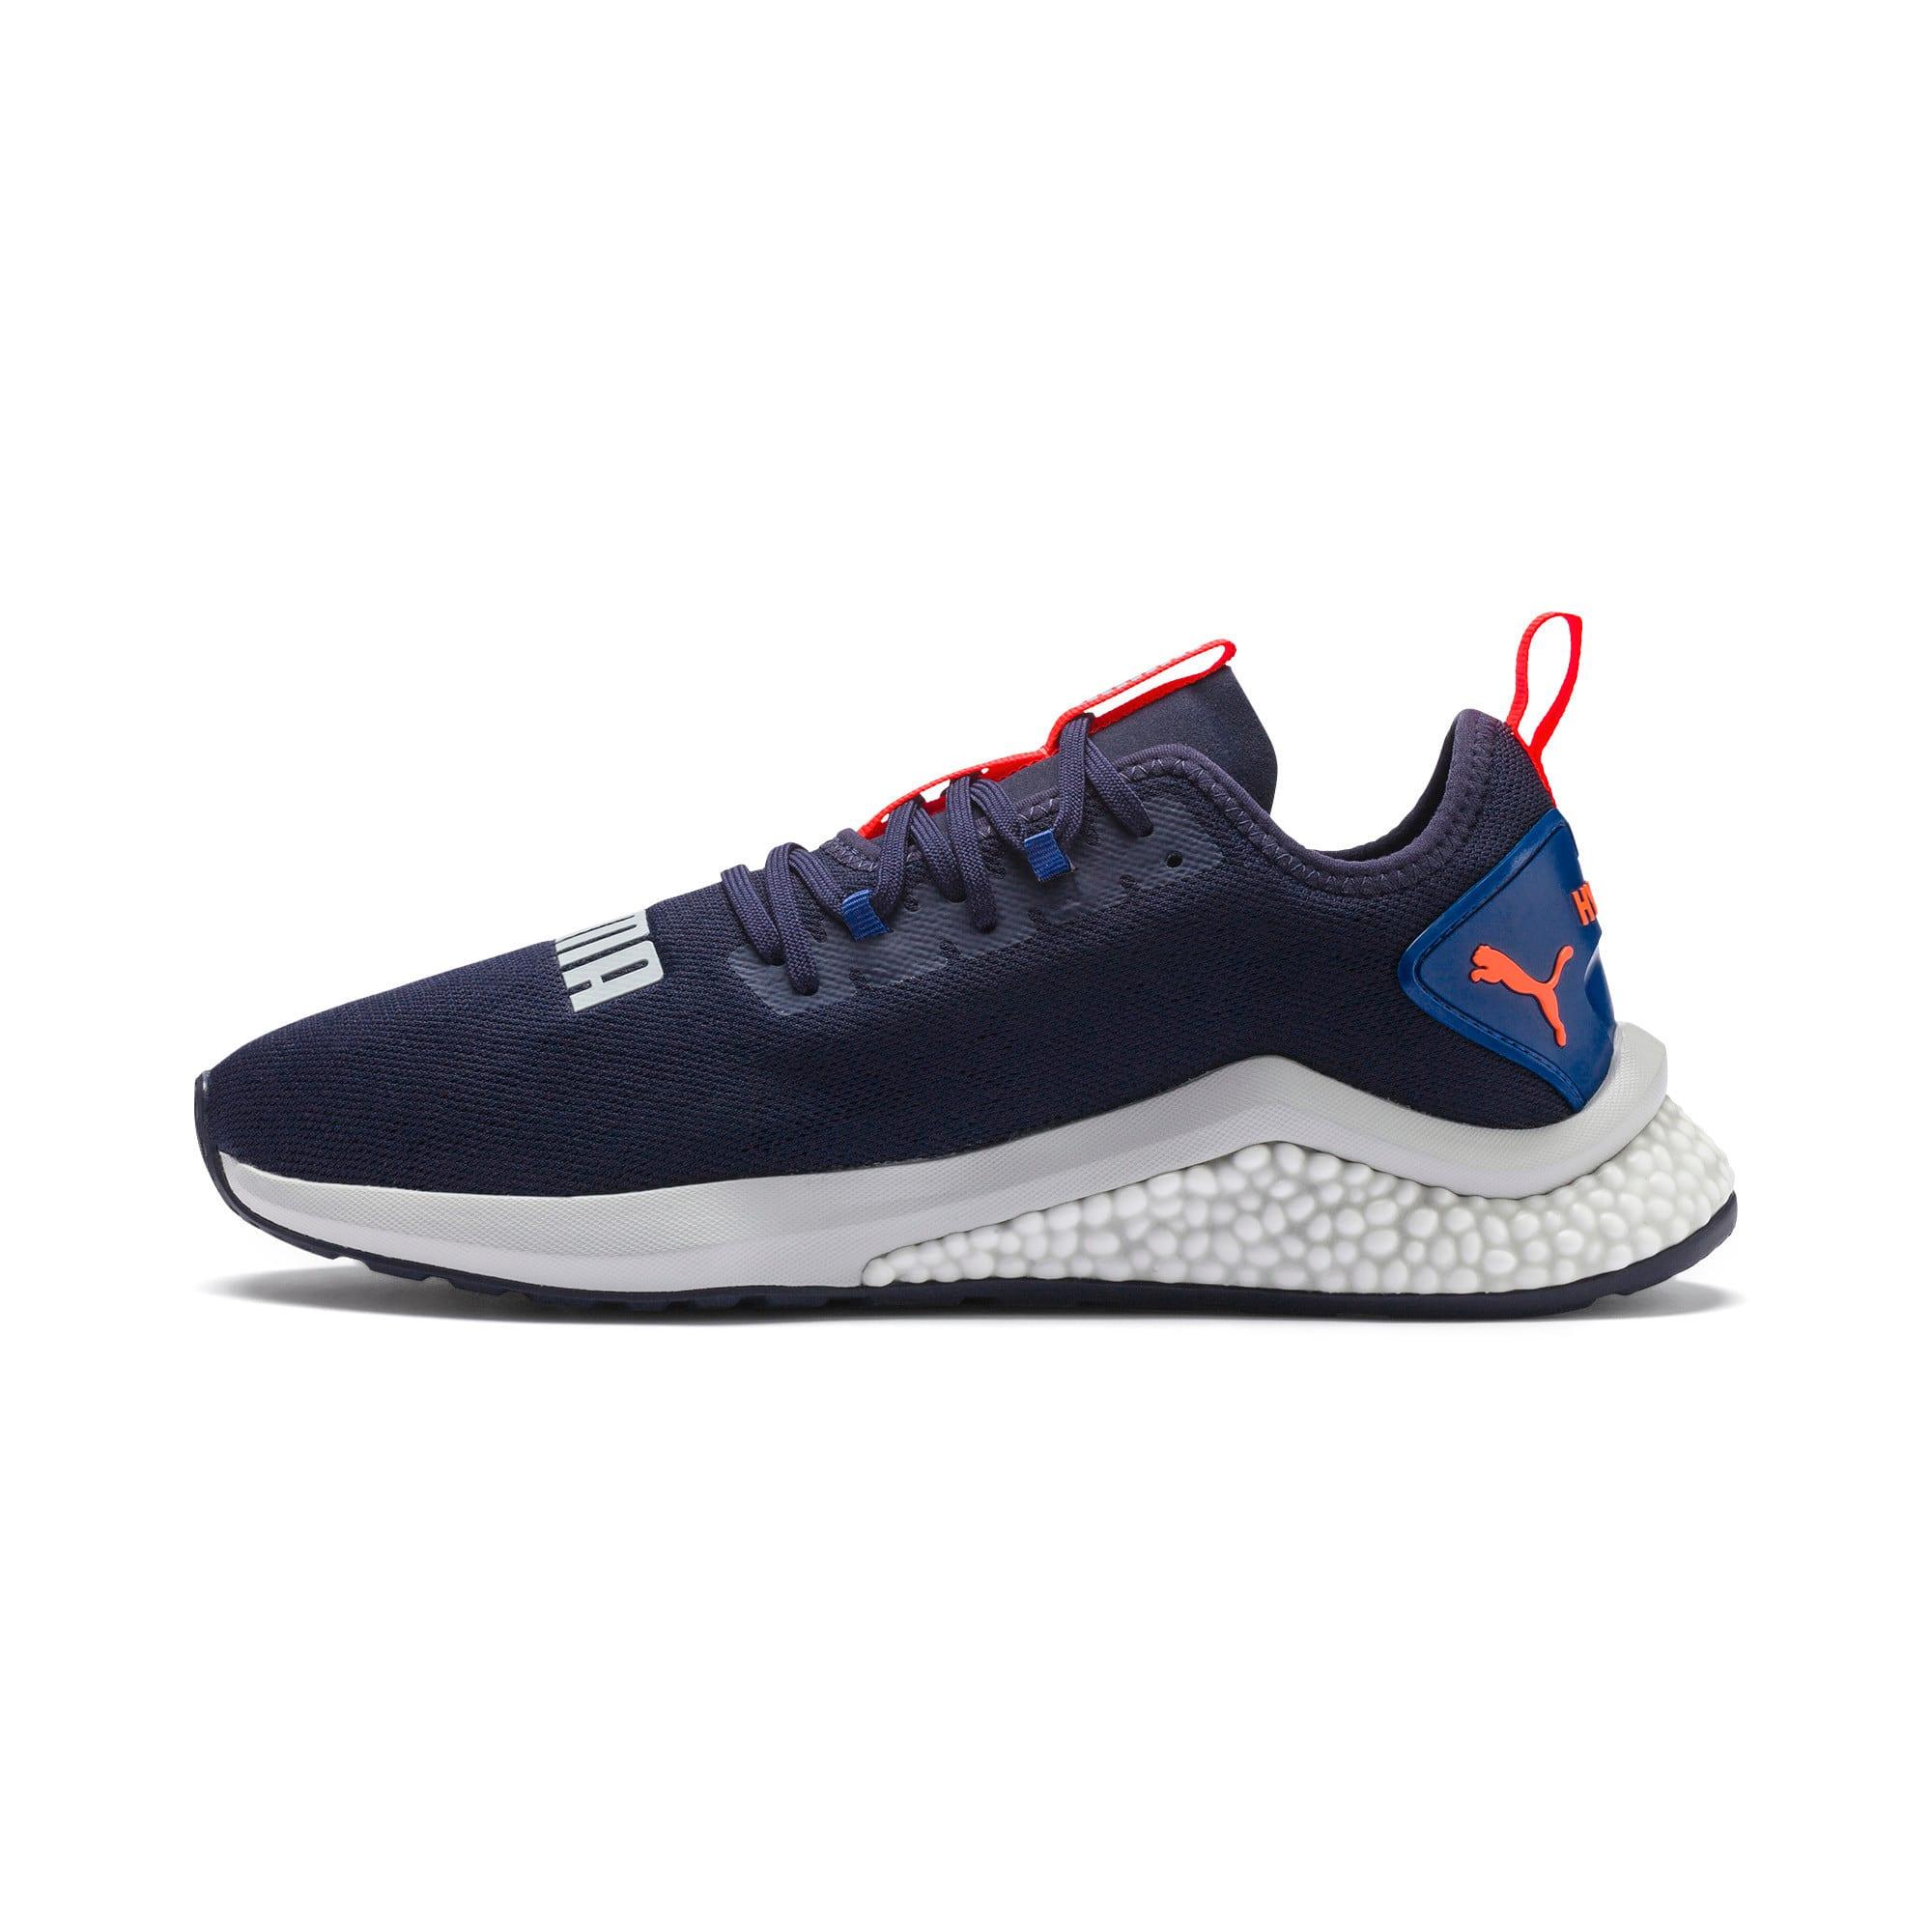 Thumbnail 1 of HYBRID NX Camo Men's Running Shoes, GalaxyBlue-Peacoat-HighRise, medium